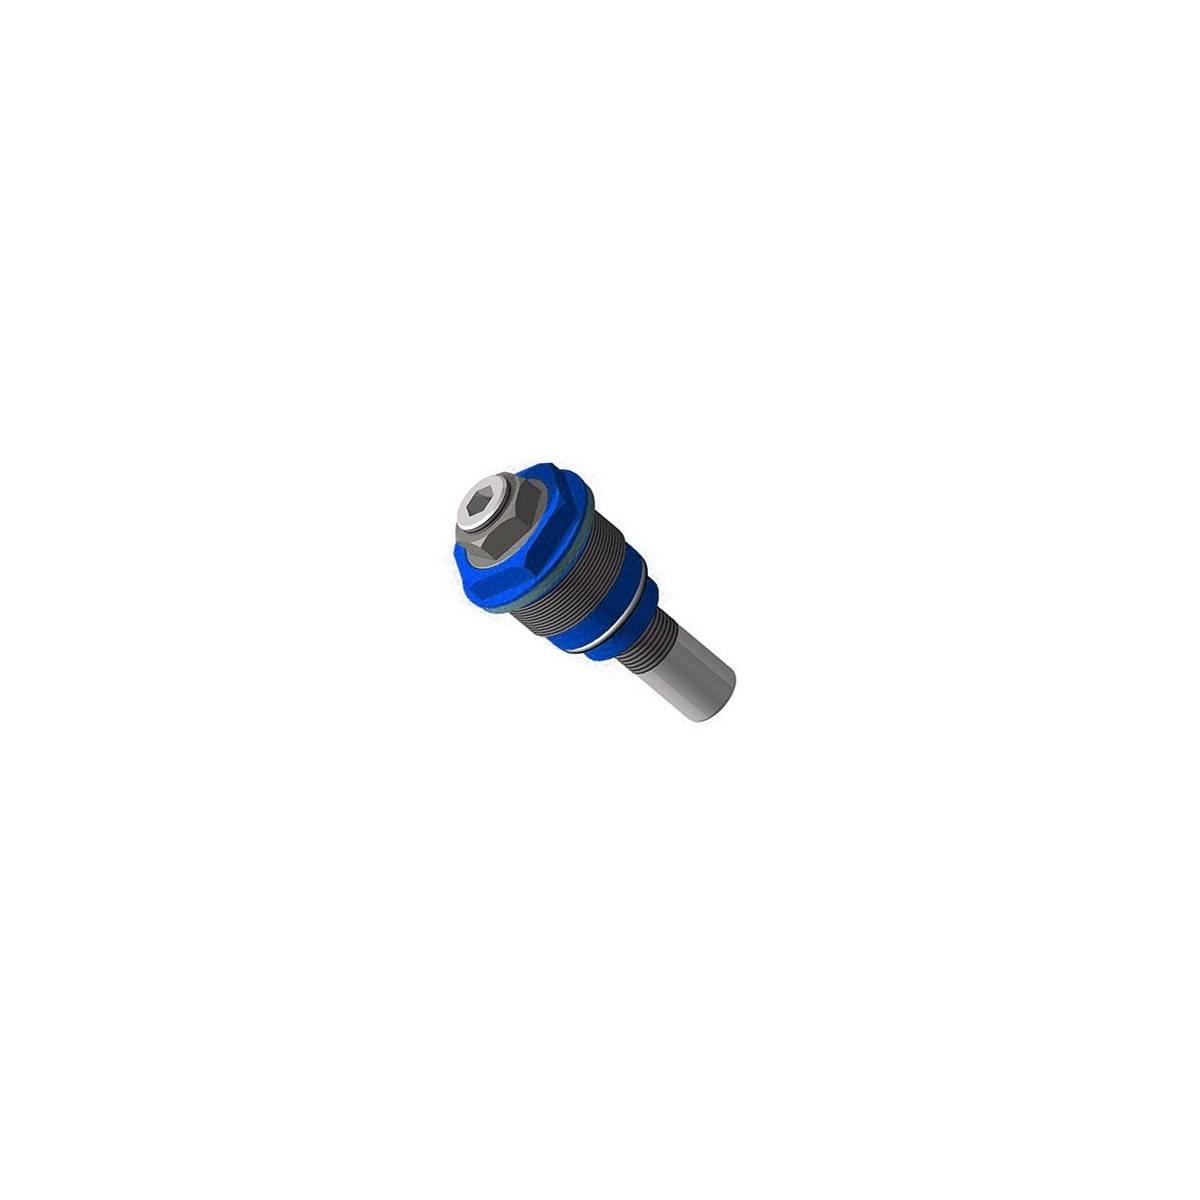 4MX101012-AZ - Tensor Cadena Distribucion Ktm 4Mx Azul